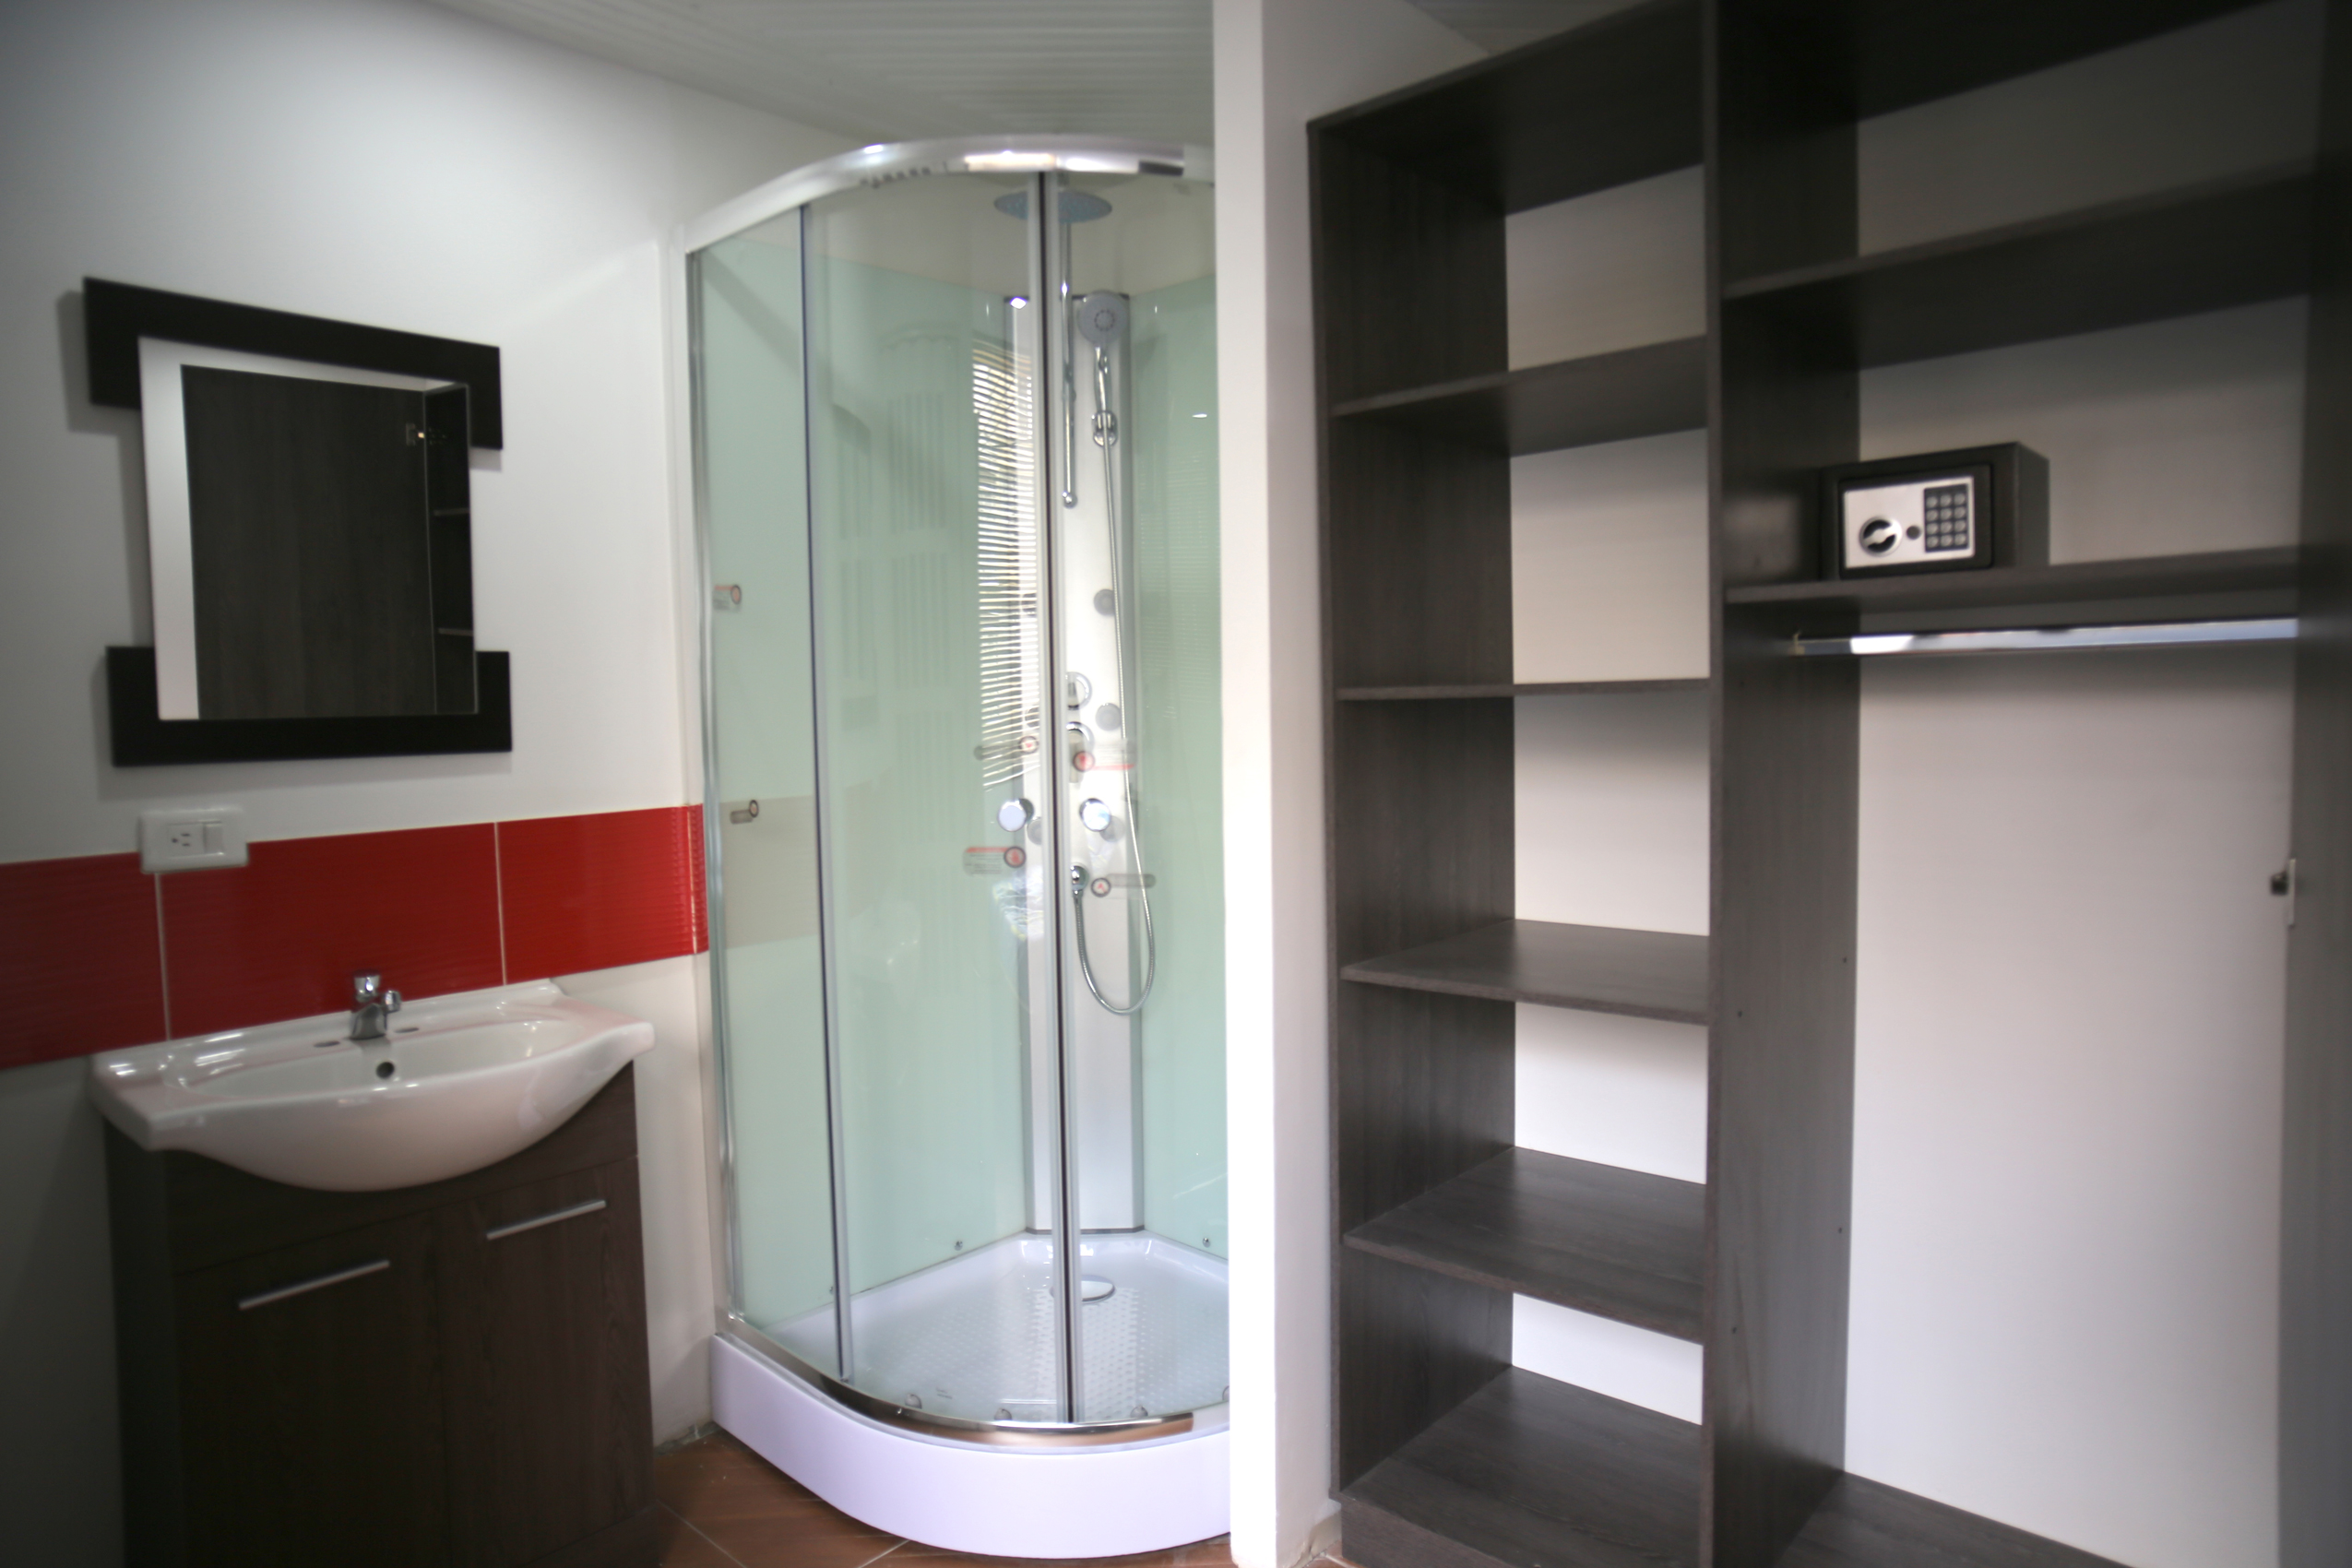 Inn House 1 ducha y closet habitaciones